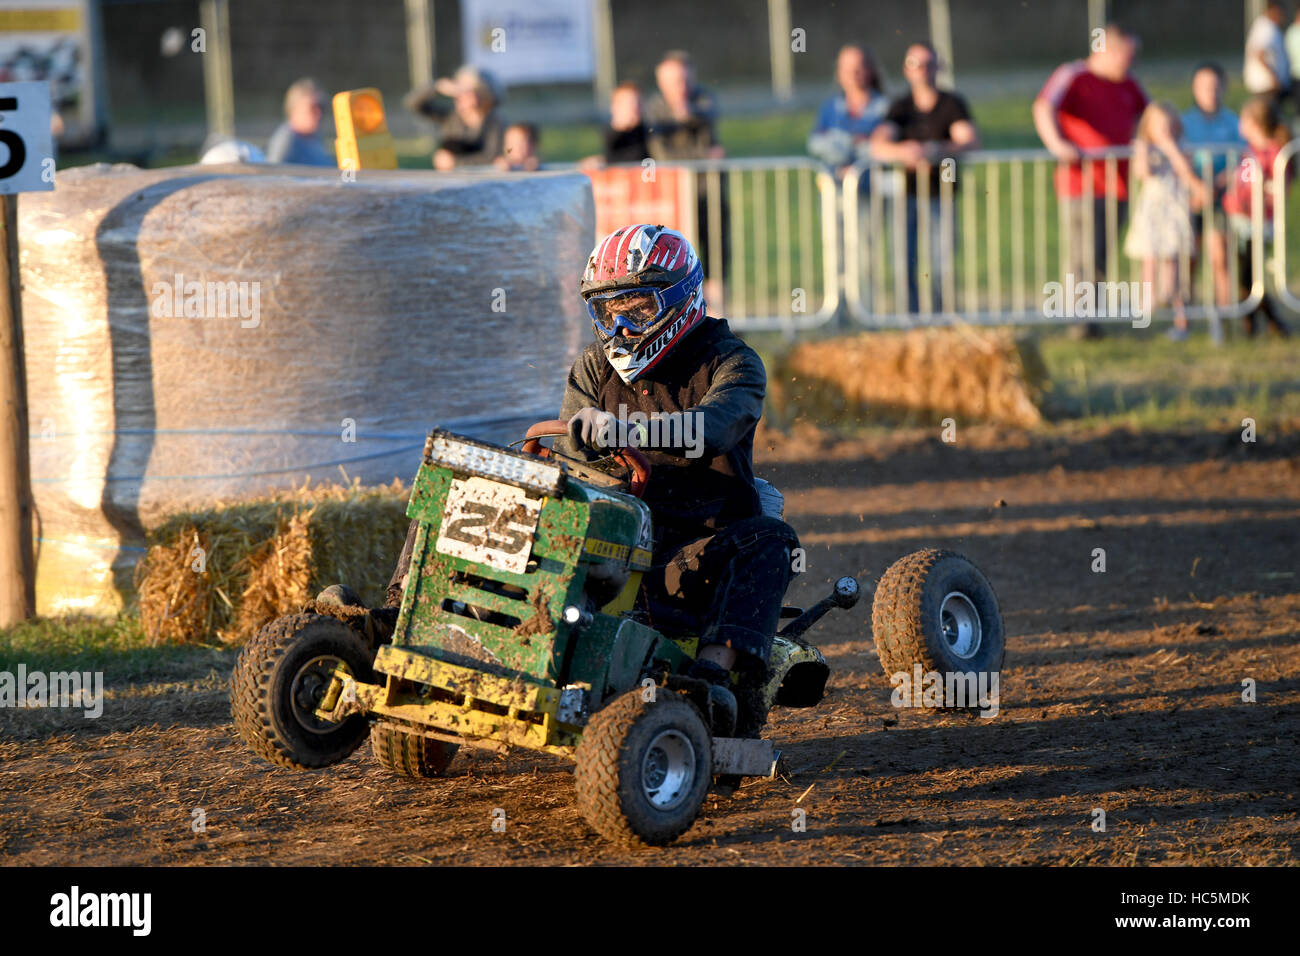 Lawn Mower Racing >> The British Lawn Mower Racing Association 12 Hour Lawn Mower